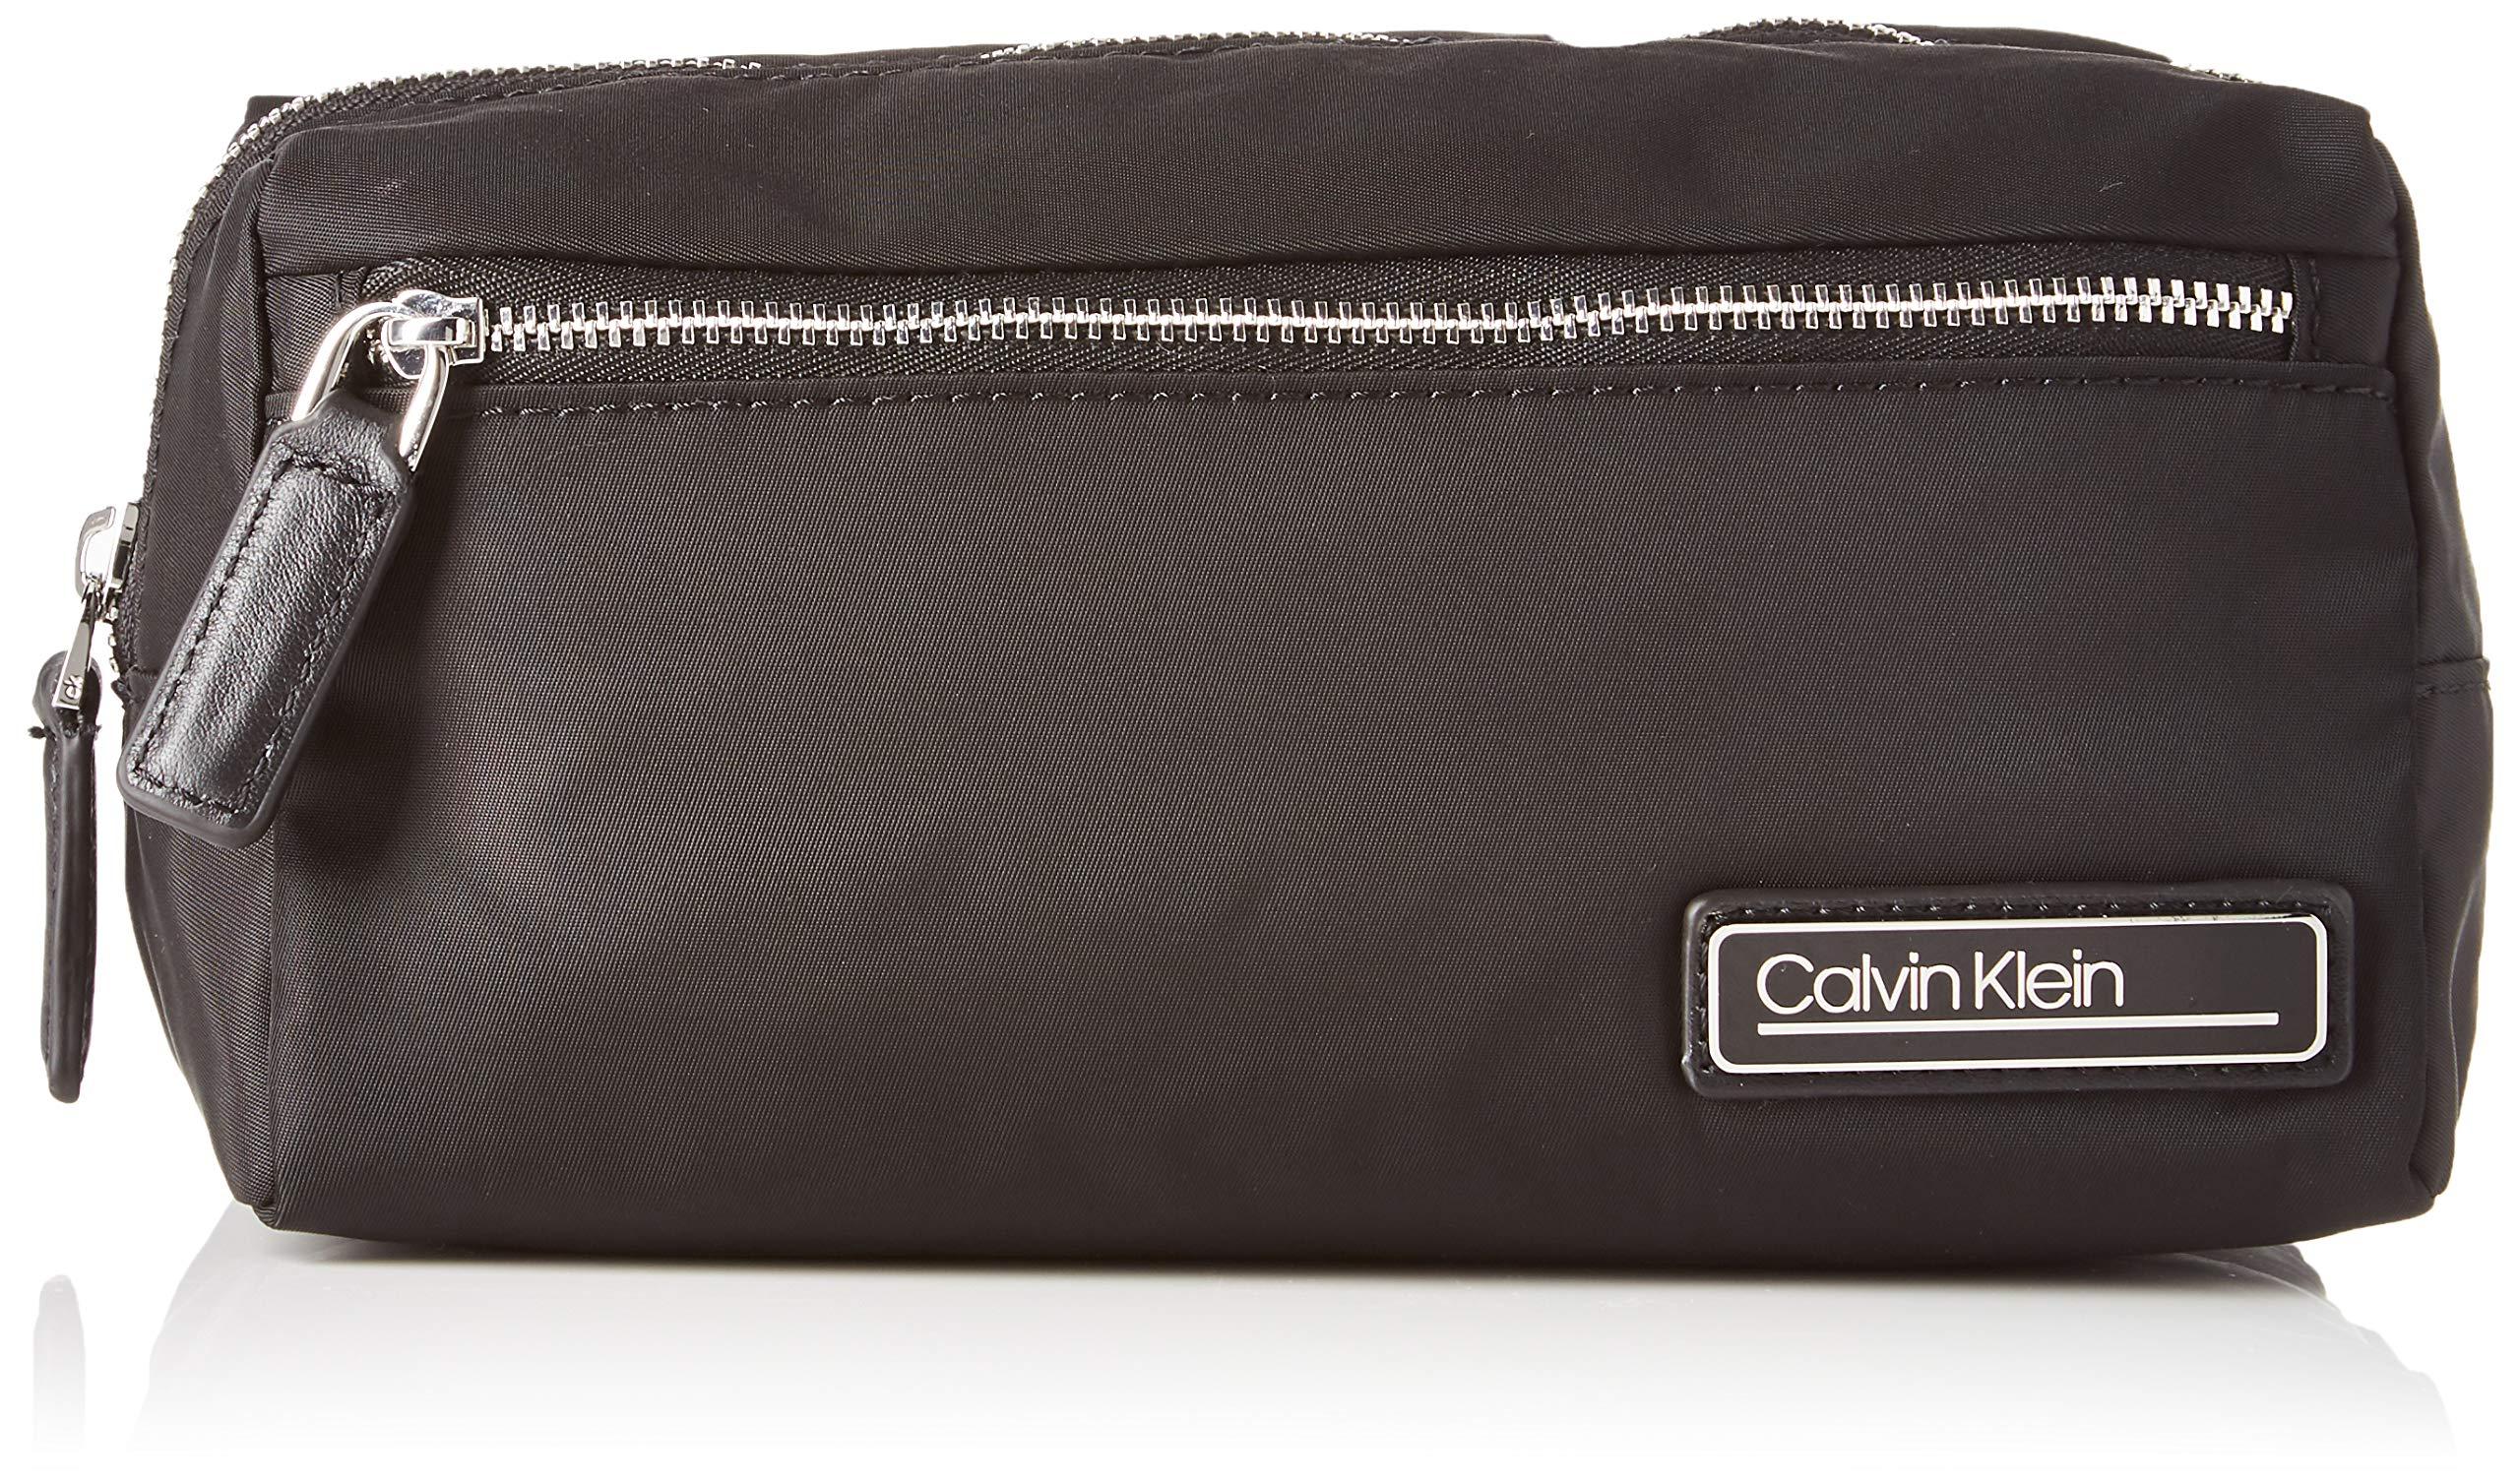 Calvin Klein PRIMARY COSMETIC BAGMujerBolsos bandoleraNegro (Black) 11.5x13x24 centimeters (B x H x T)